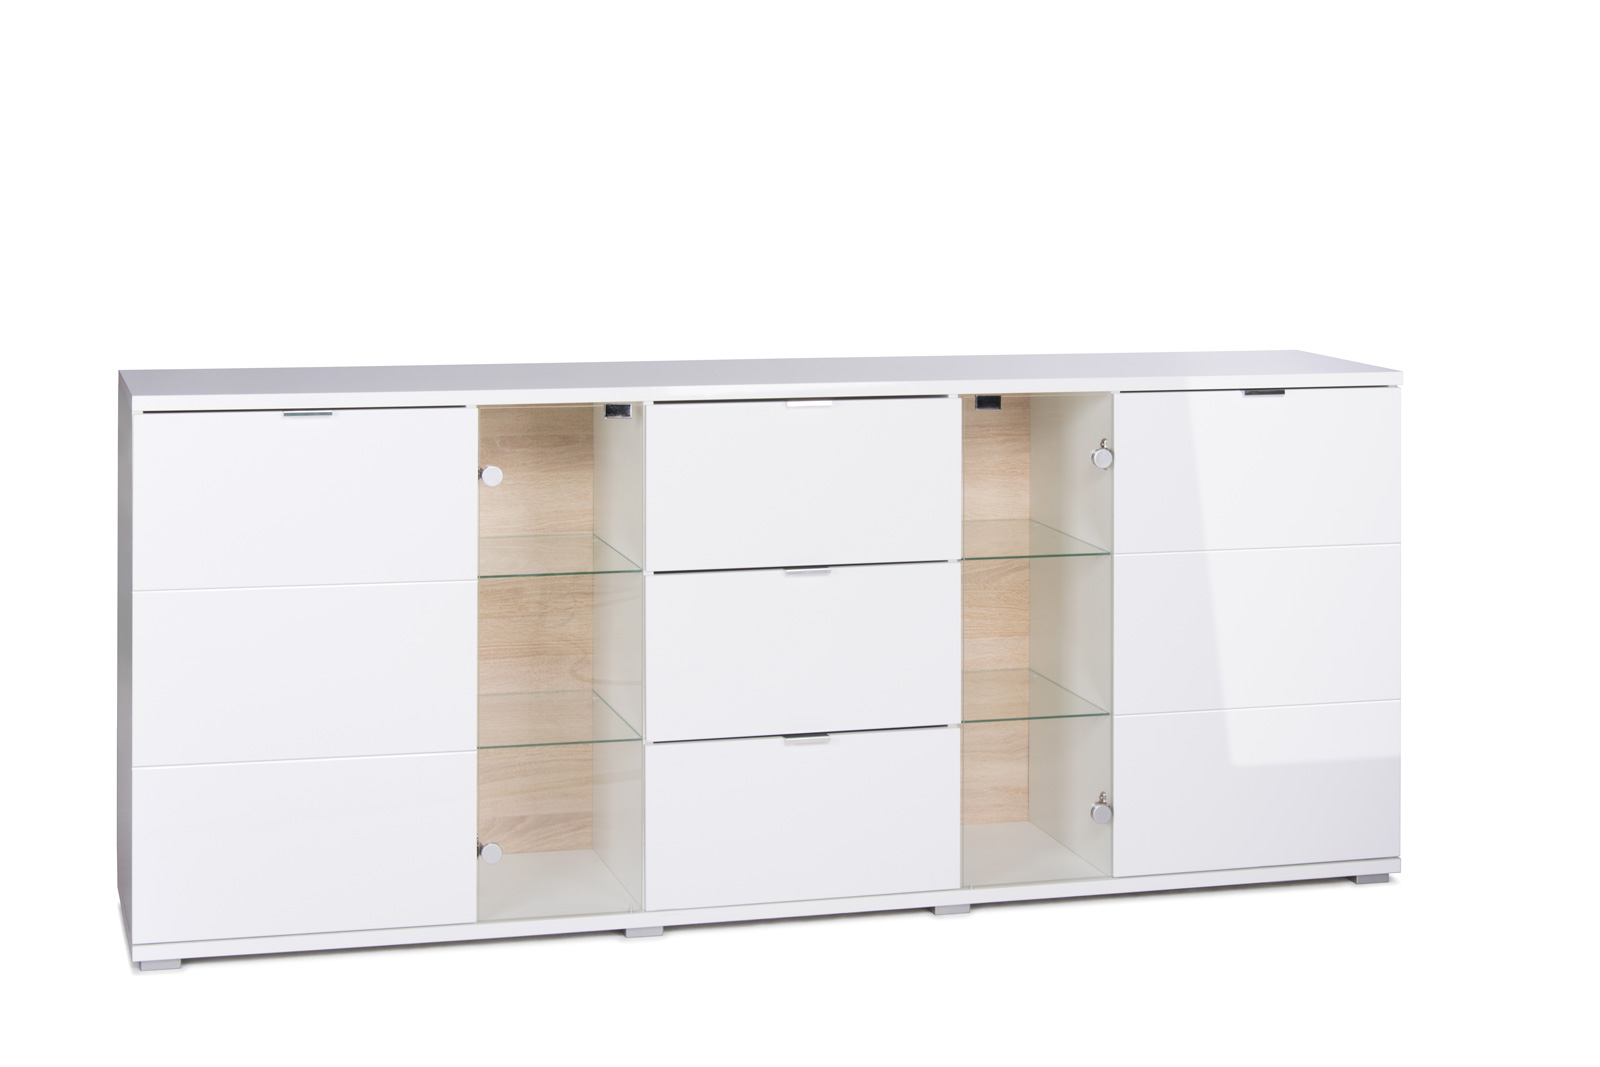 Sam sideboard holz 200 x 85 cm glossy 4 auf lager for Sideboard 200 cm holz